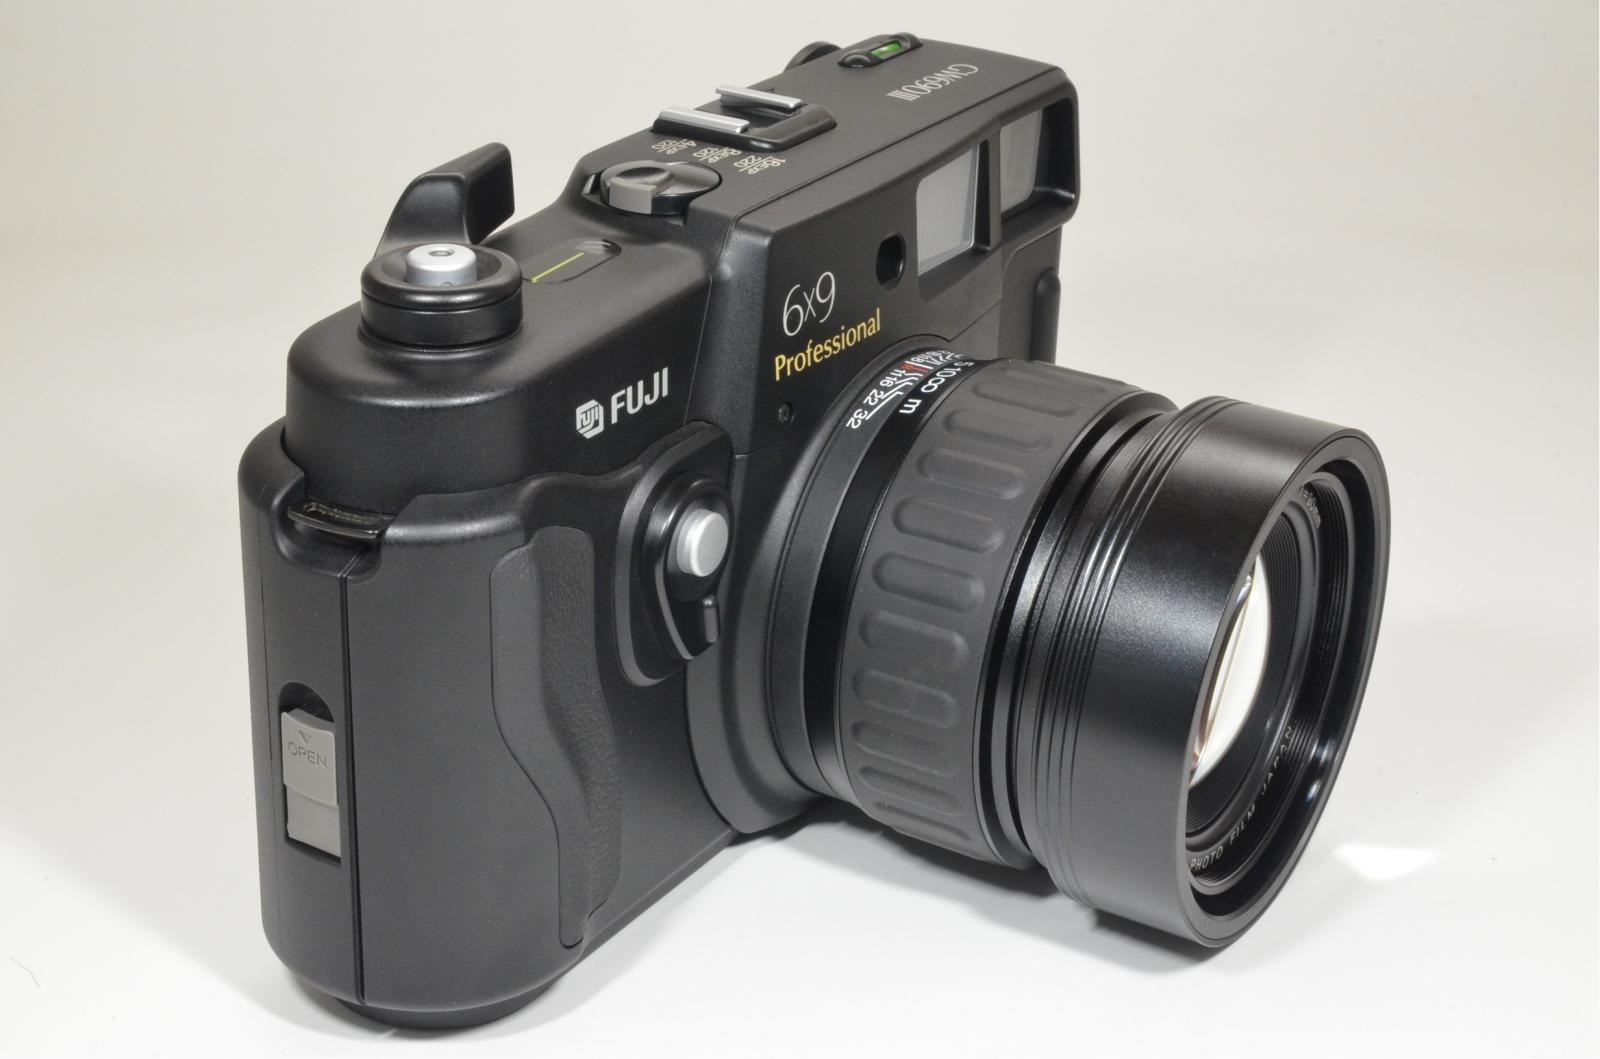 fuji fujifilm gw690iii 90mm f3.5 medium format count only 027 rare!